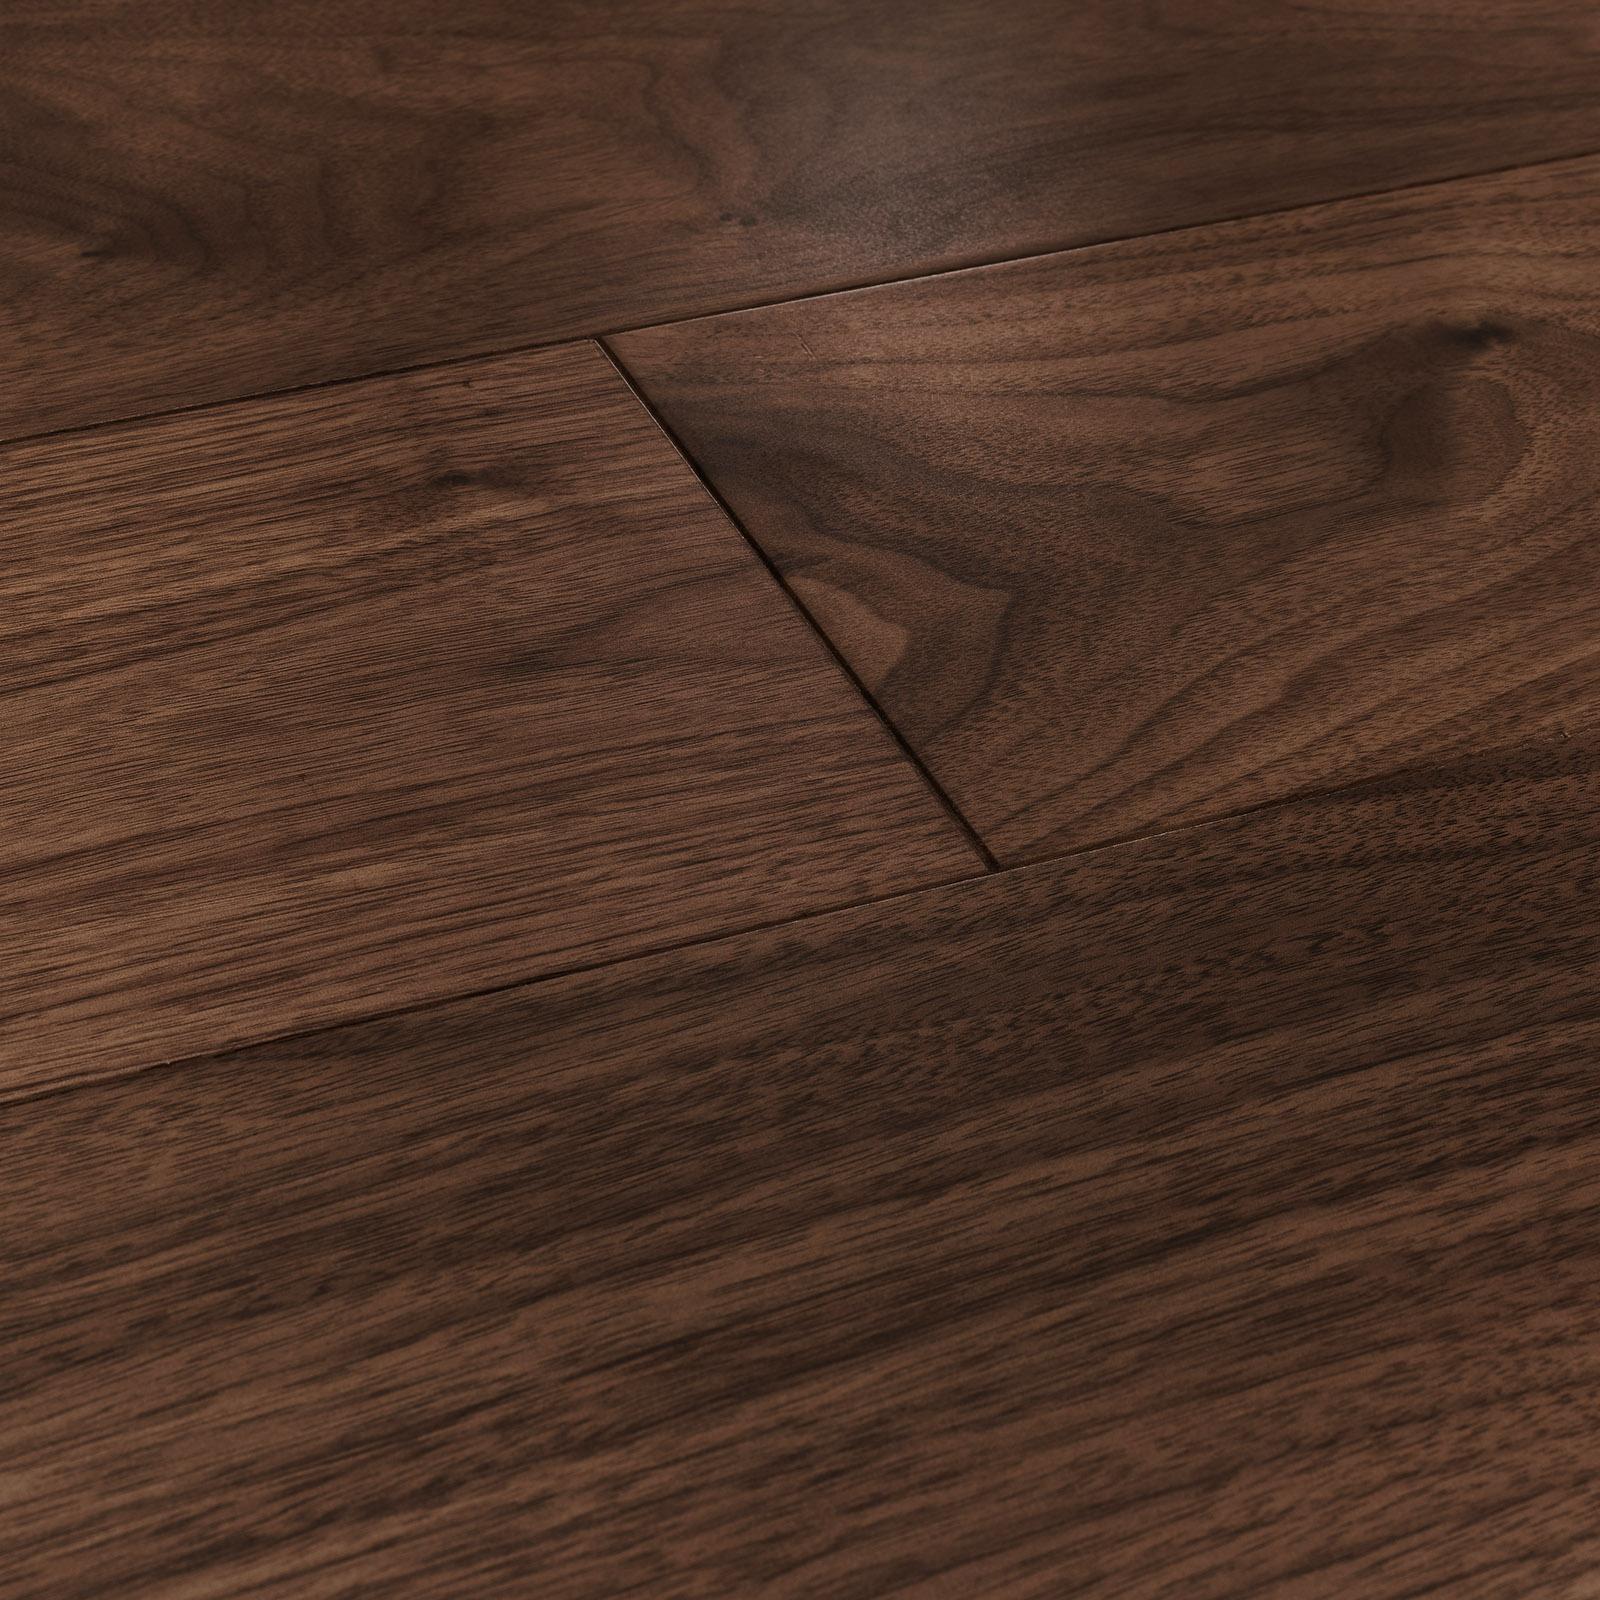 Engineered wood flooring. Berkeley walnut